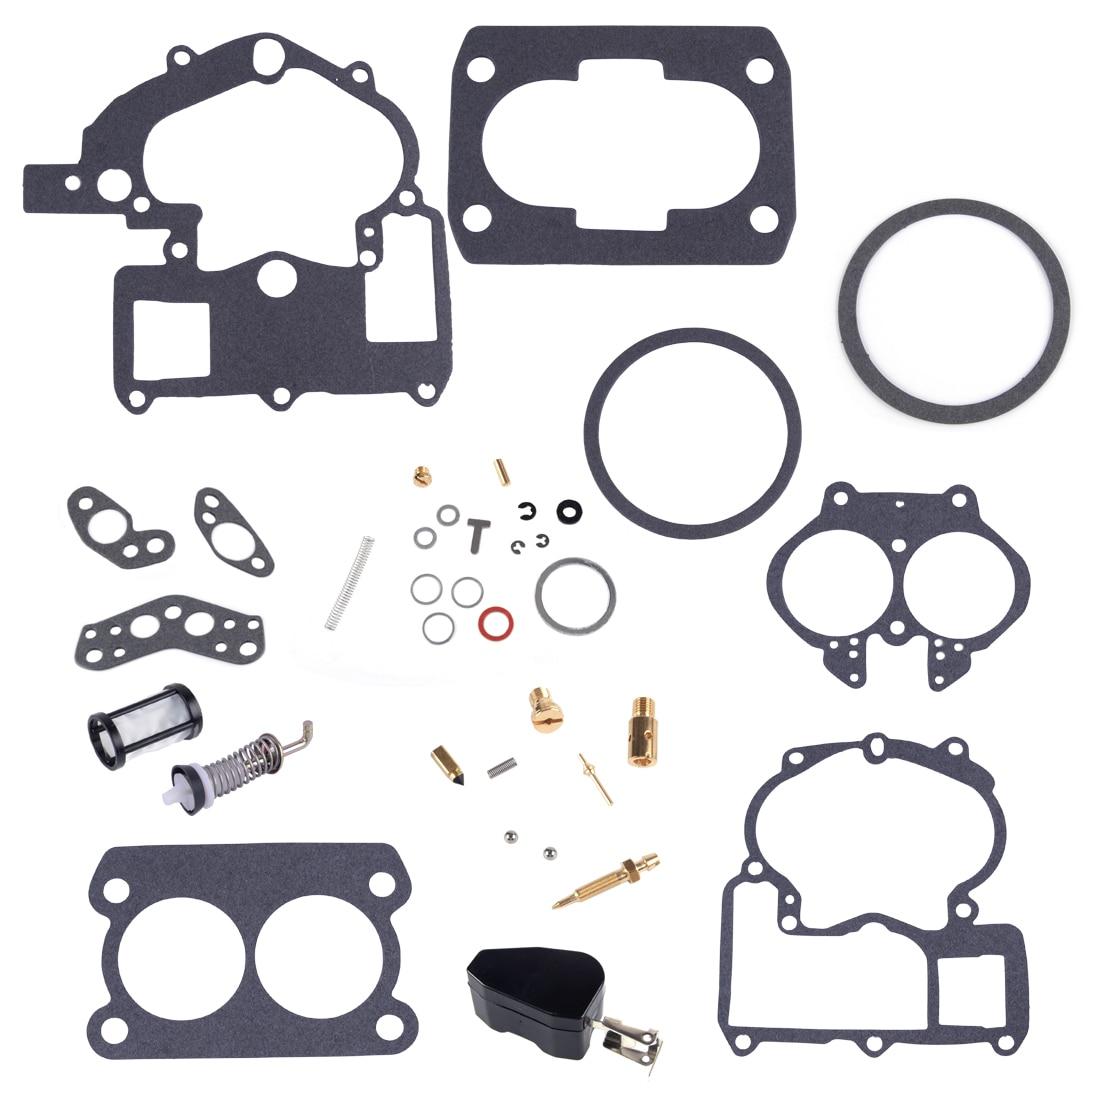 LETAOSK Carburetor Rebuild Tool Kit Fit For Mercruiser Marine 2Barrel 3302-804844002